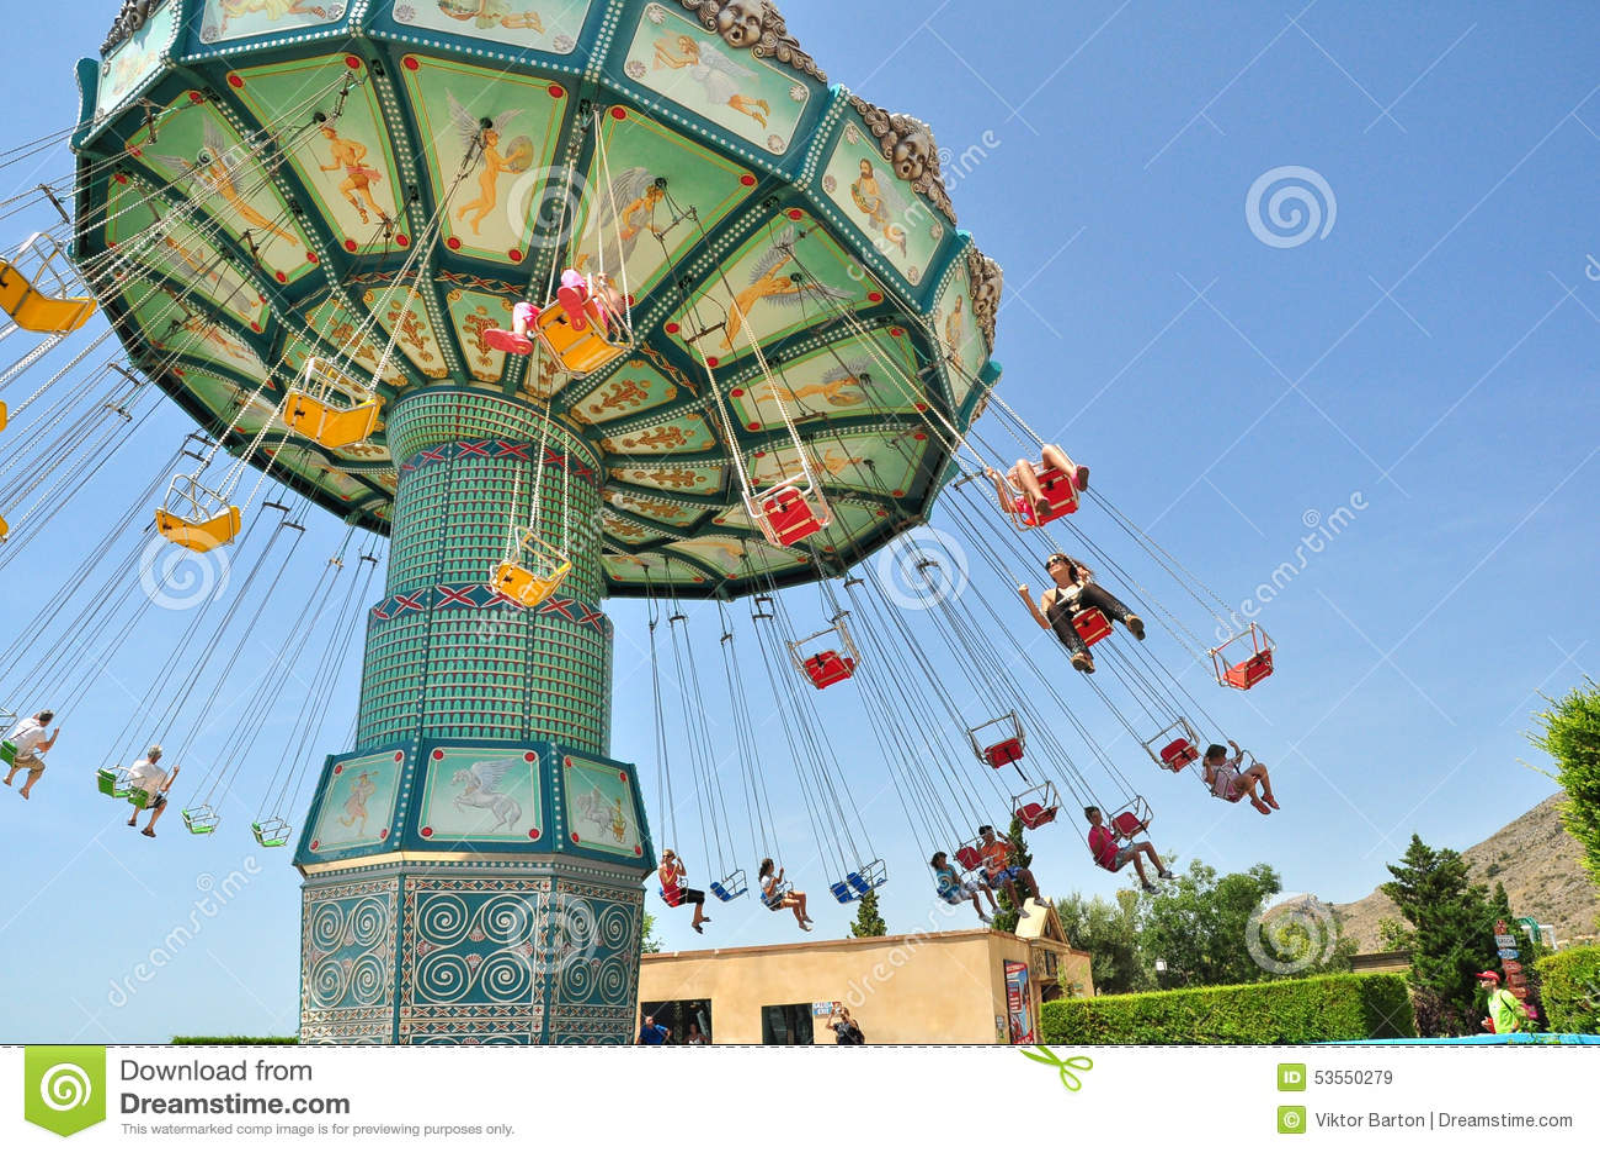 Benidorm carrousel,